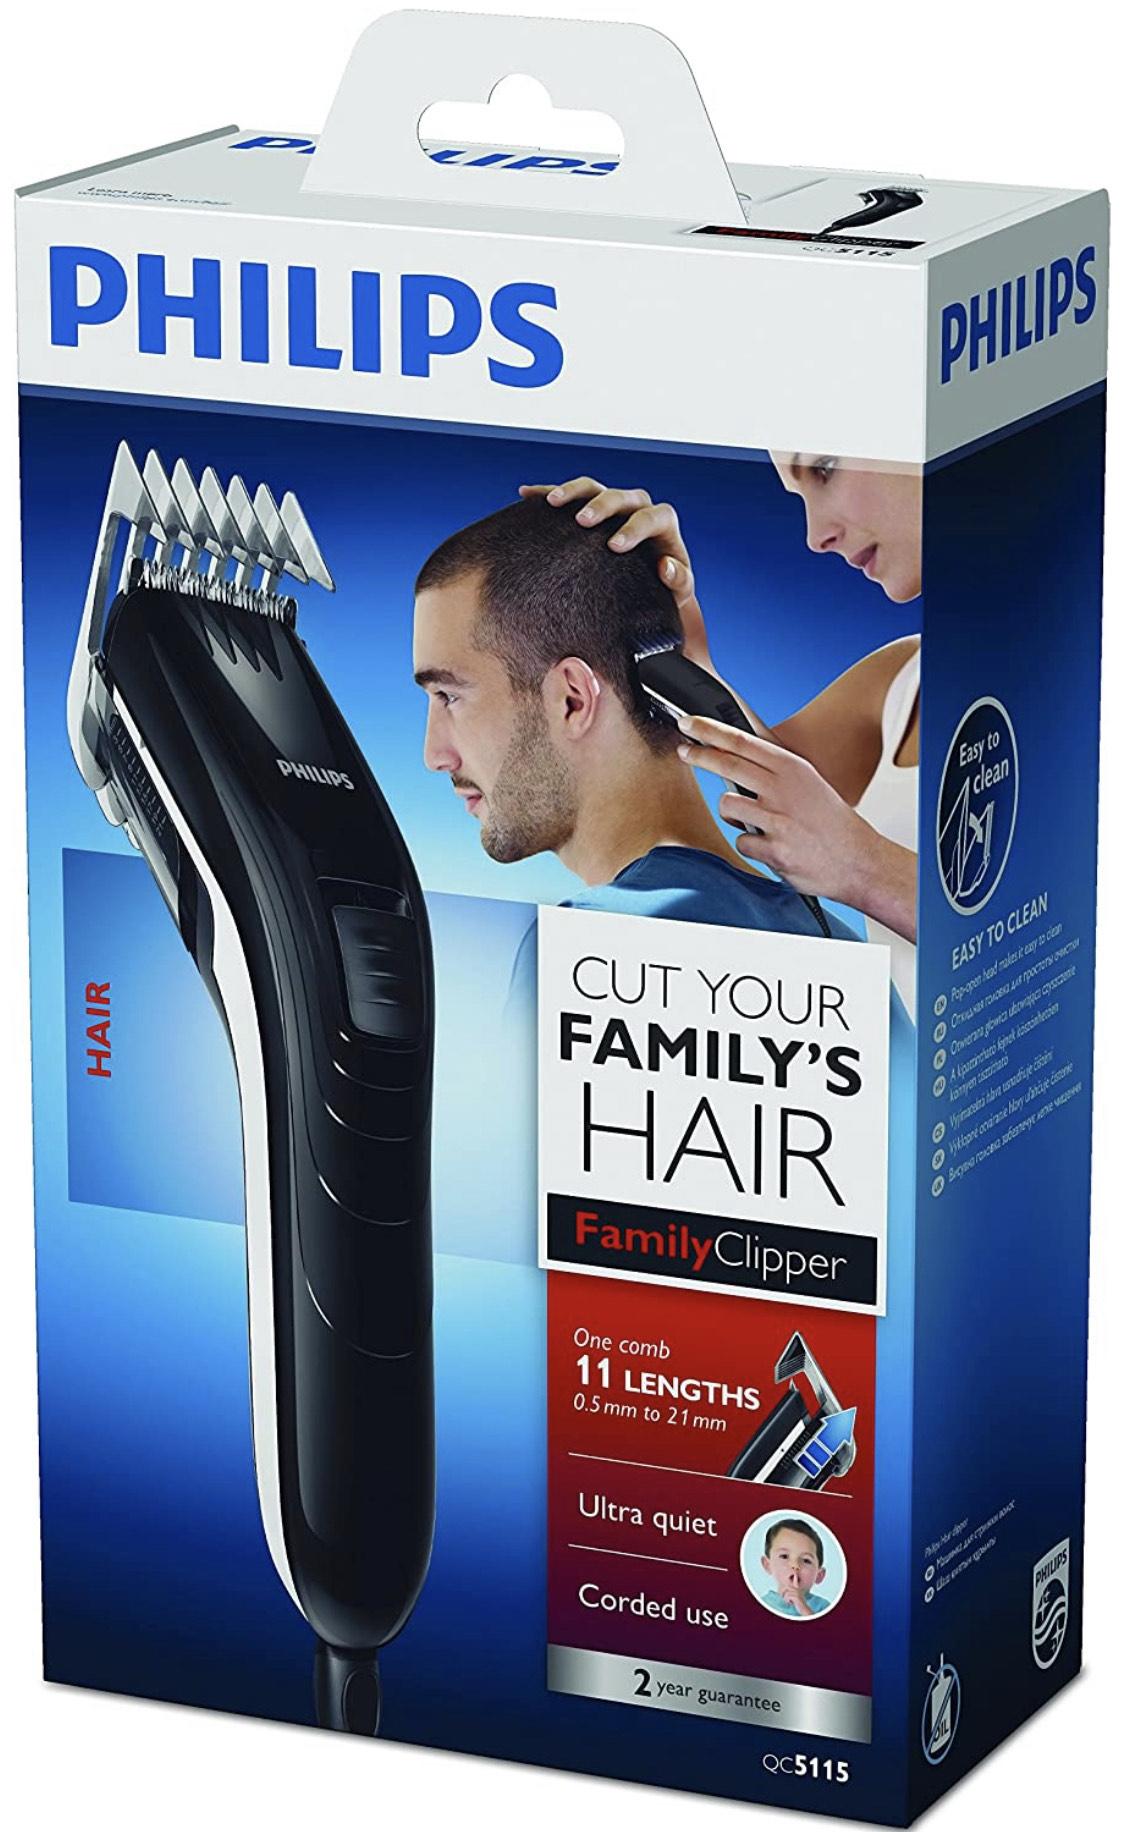 Philips Series 3000 Hair Trimmer 11 Lengths QC5115/15 Black £19.74 + £4.49 NP @ Amazon